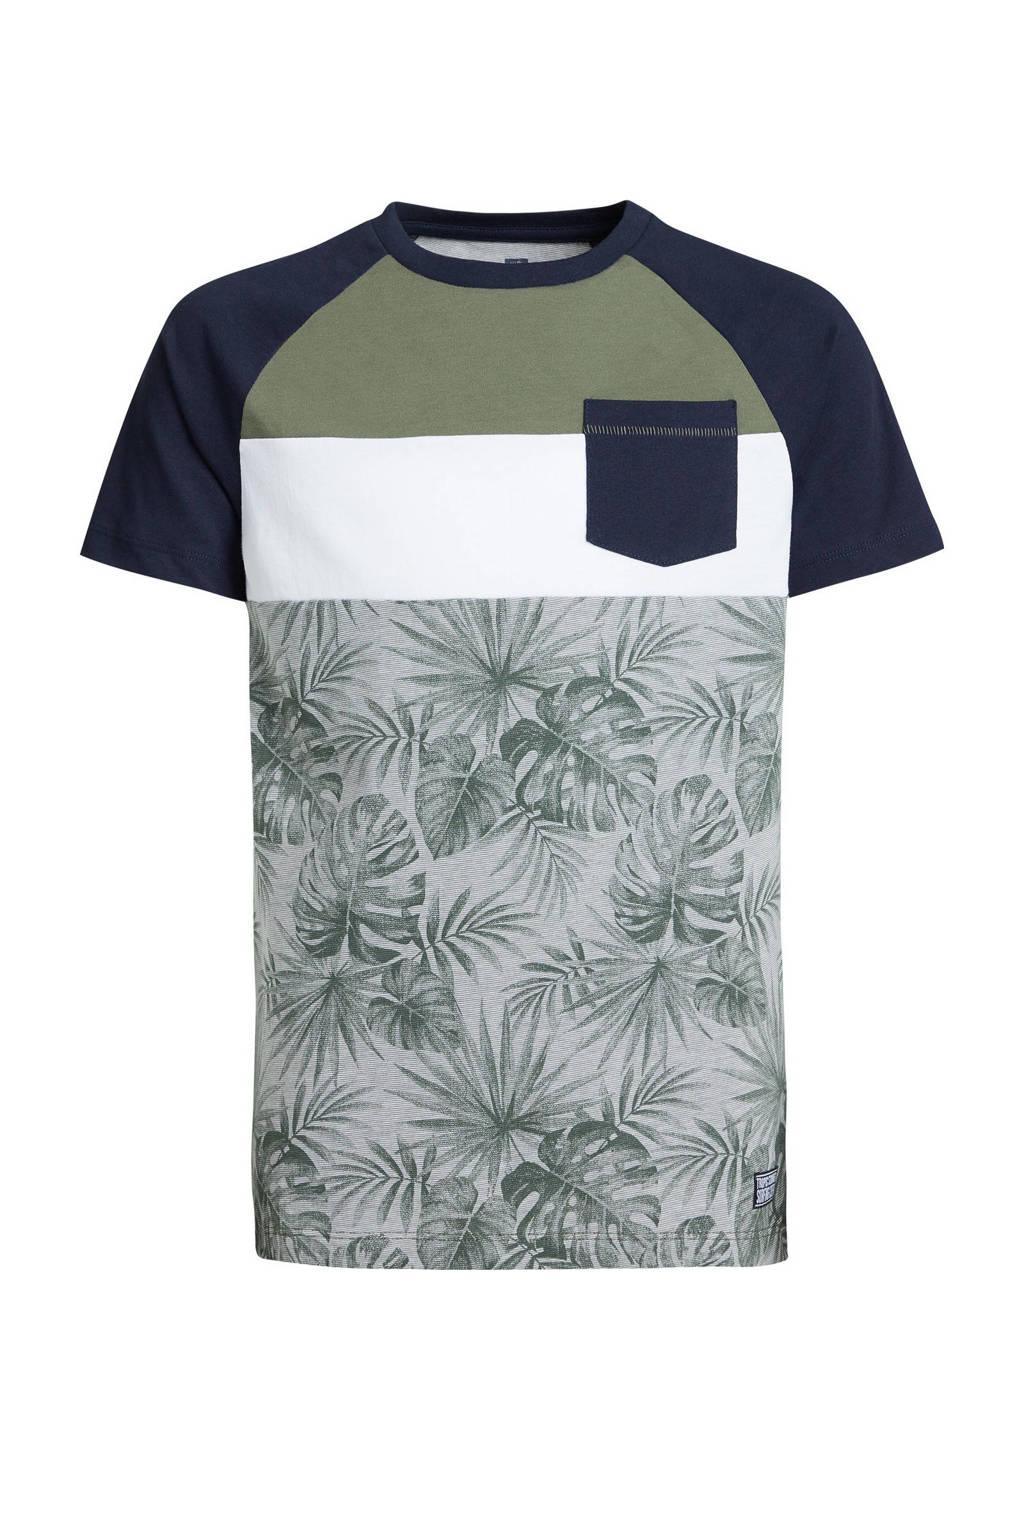 WE Fashion T-shirt met bladprint army groen/zwart/wit, Army groen/zwart/wit